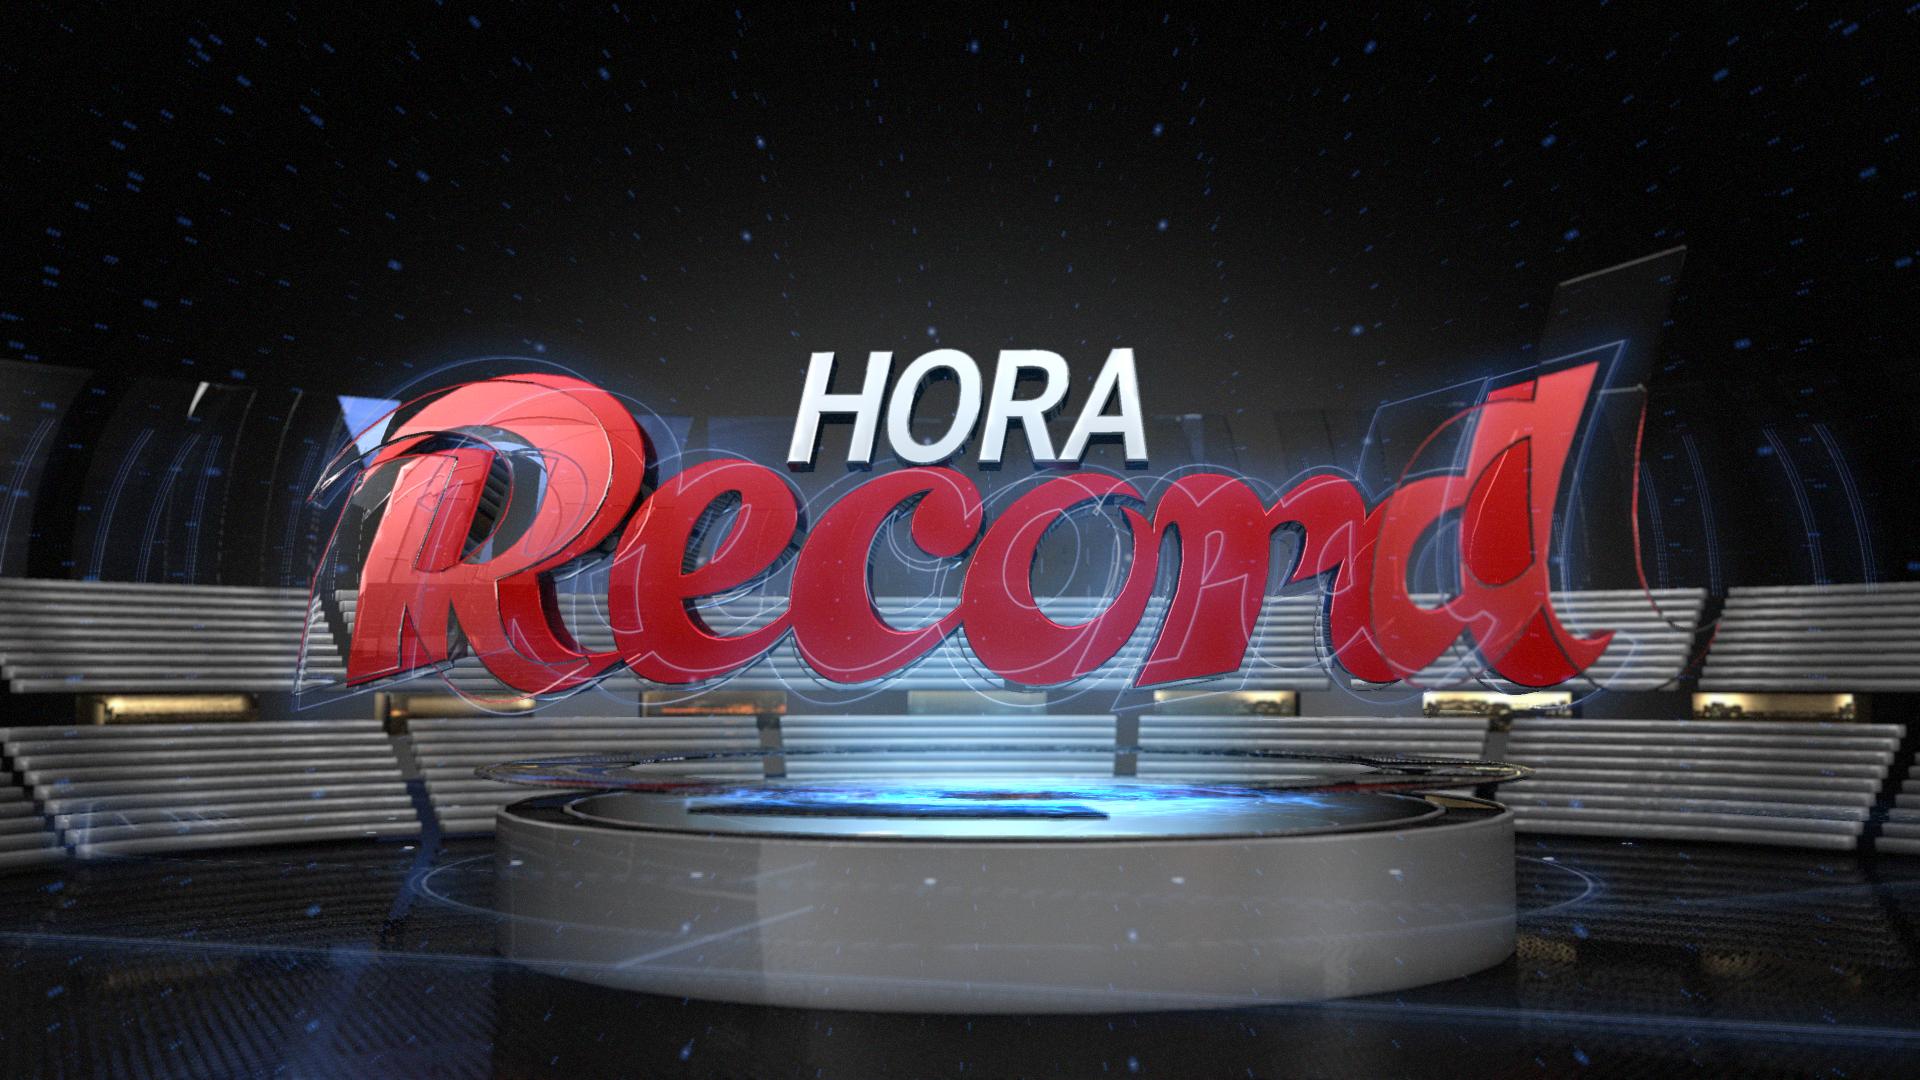 HORA_RECORD